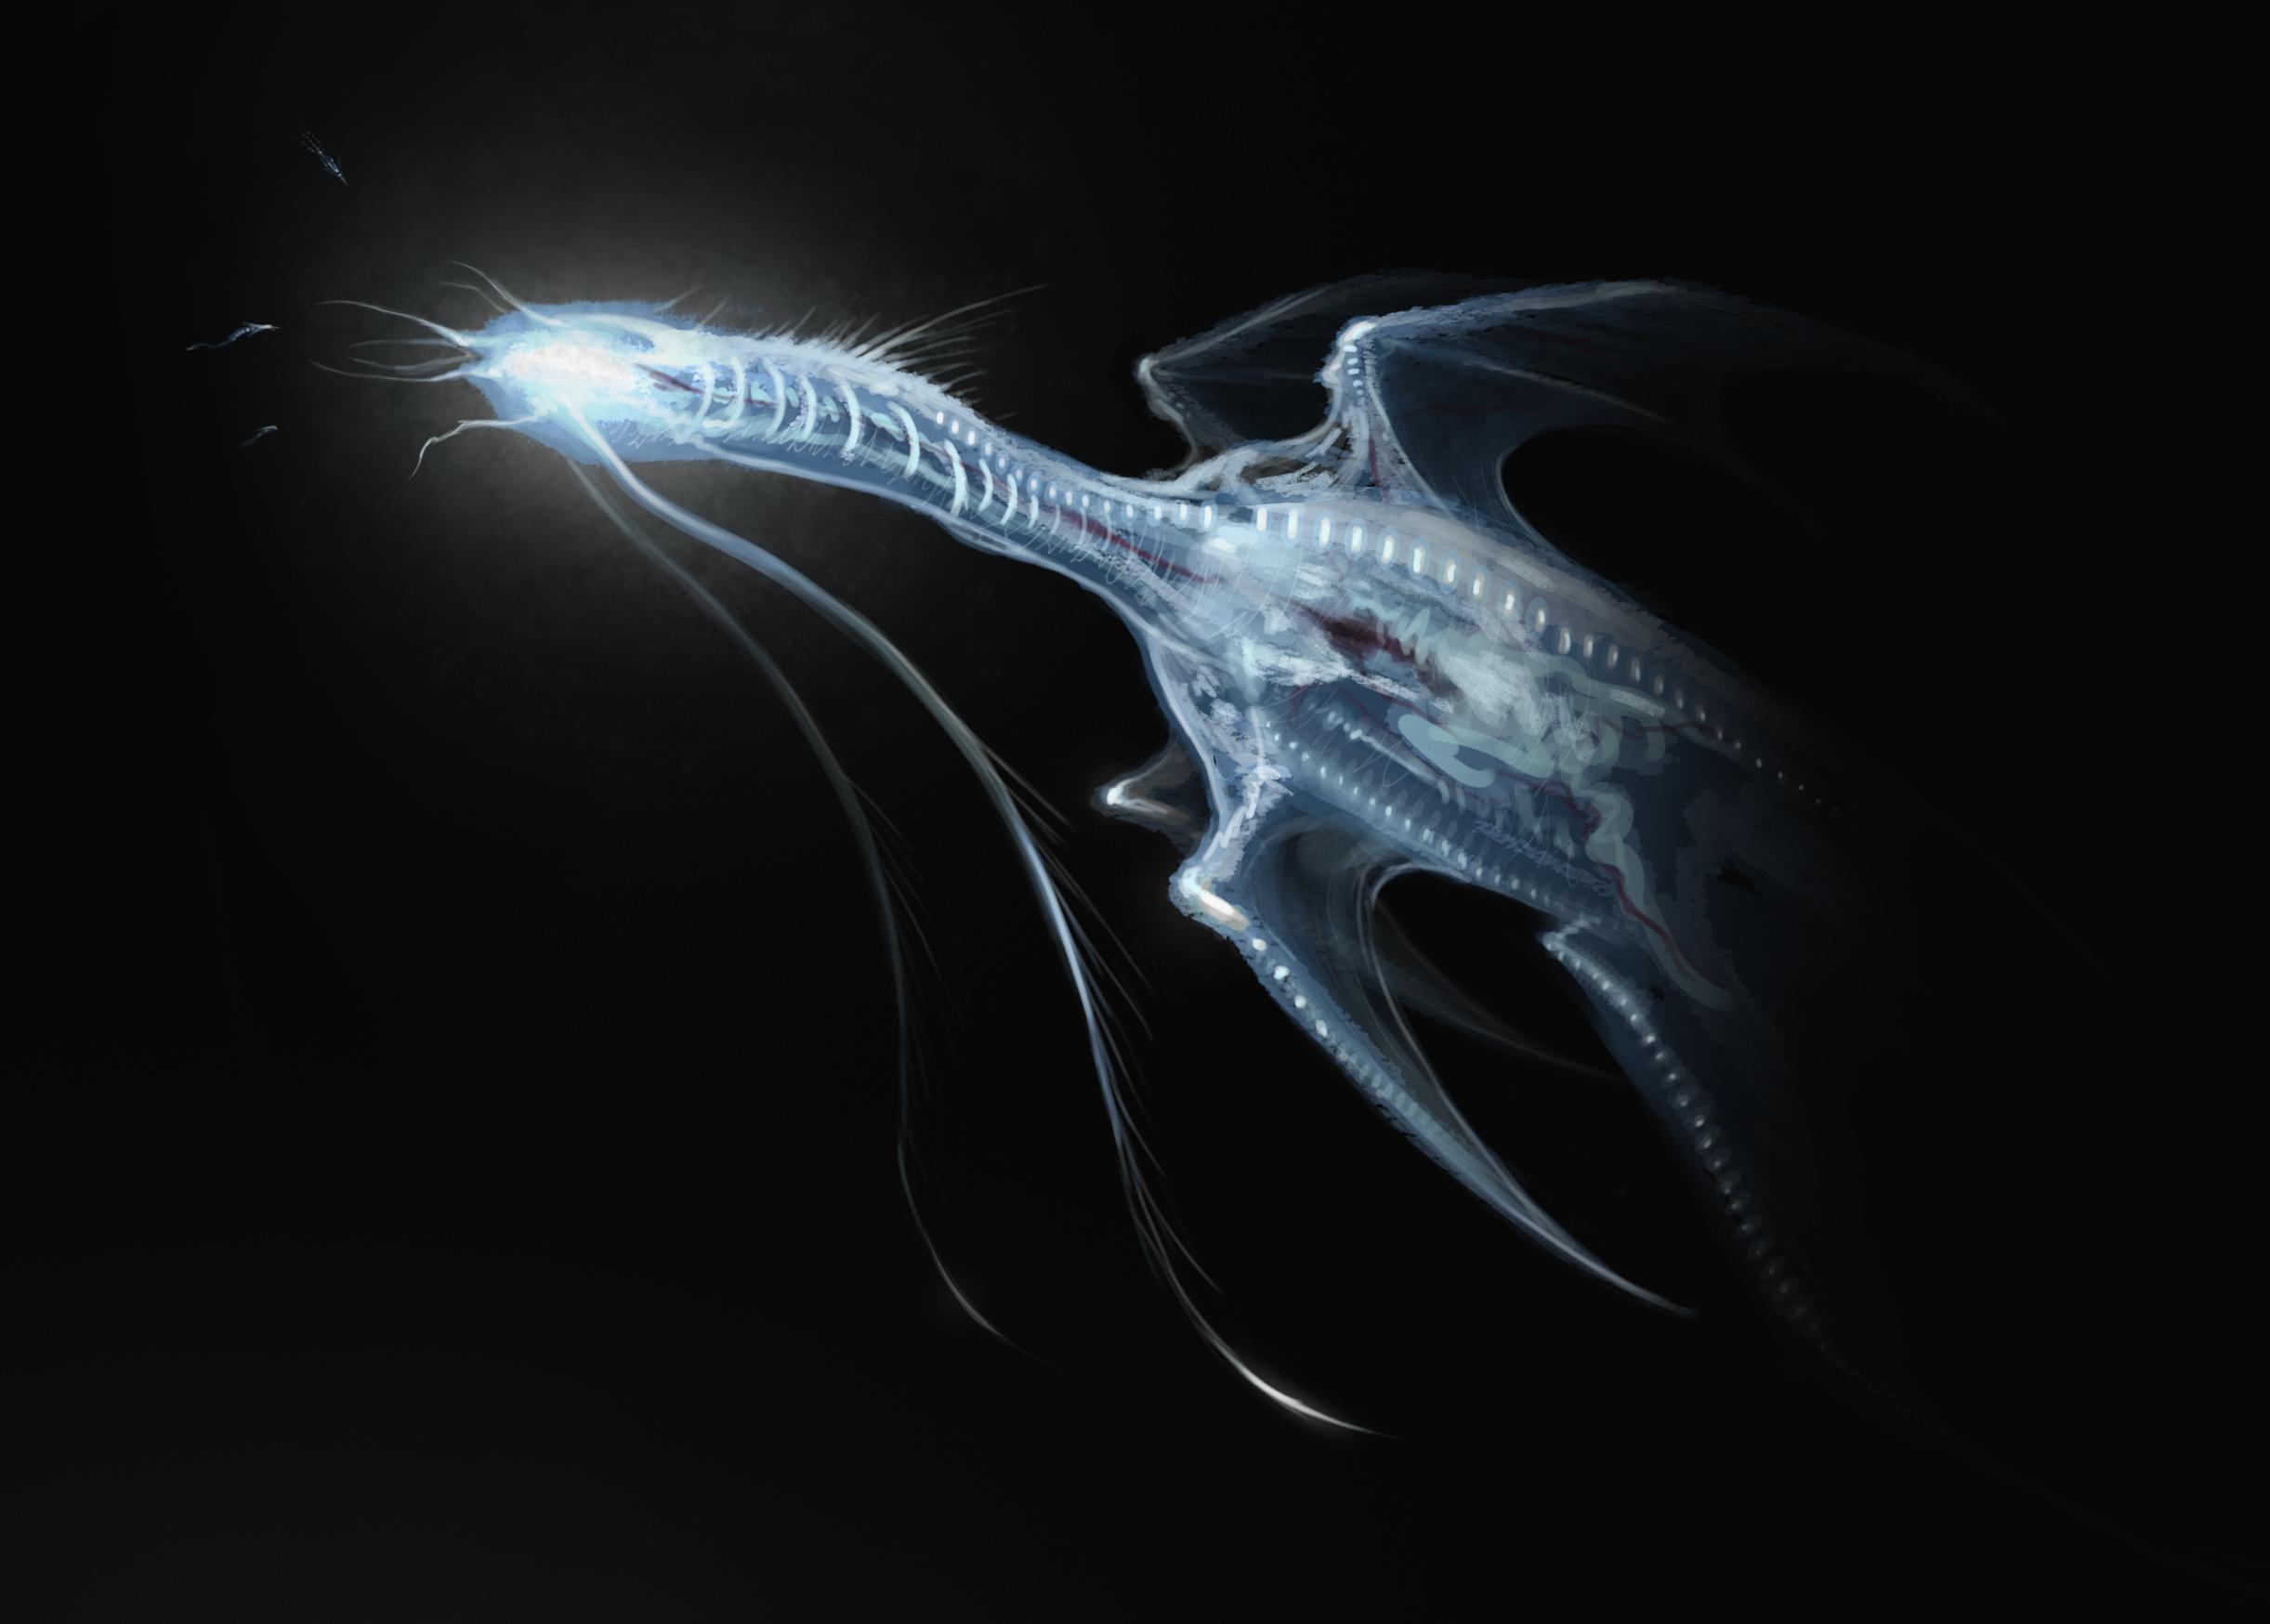 Dracolestia xengola by rpowell77